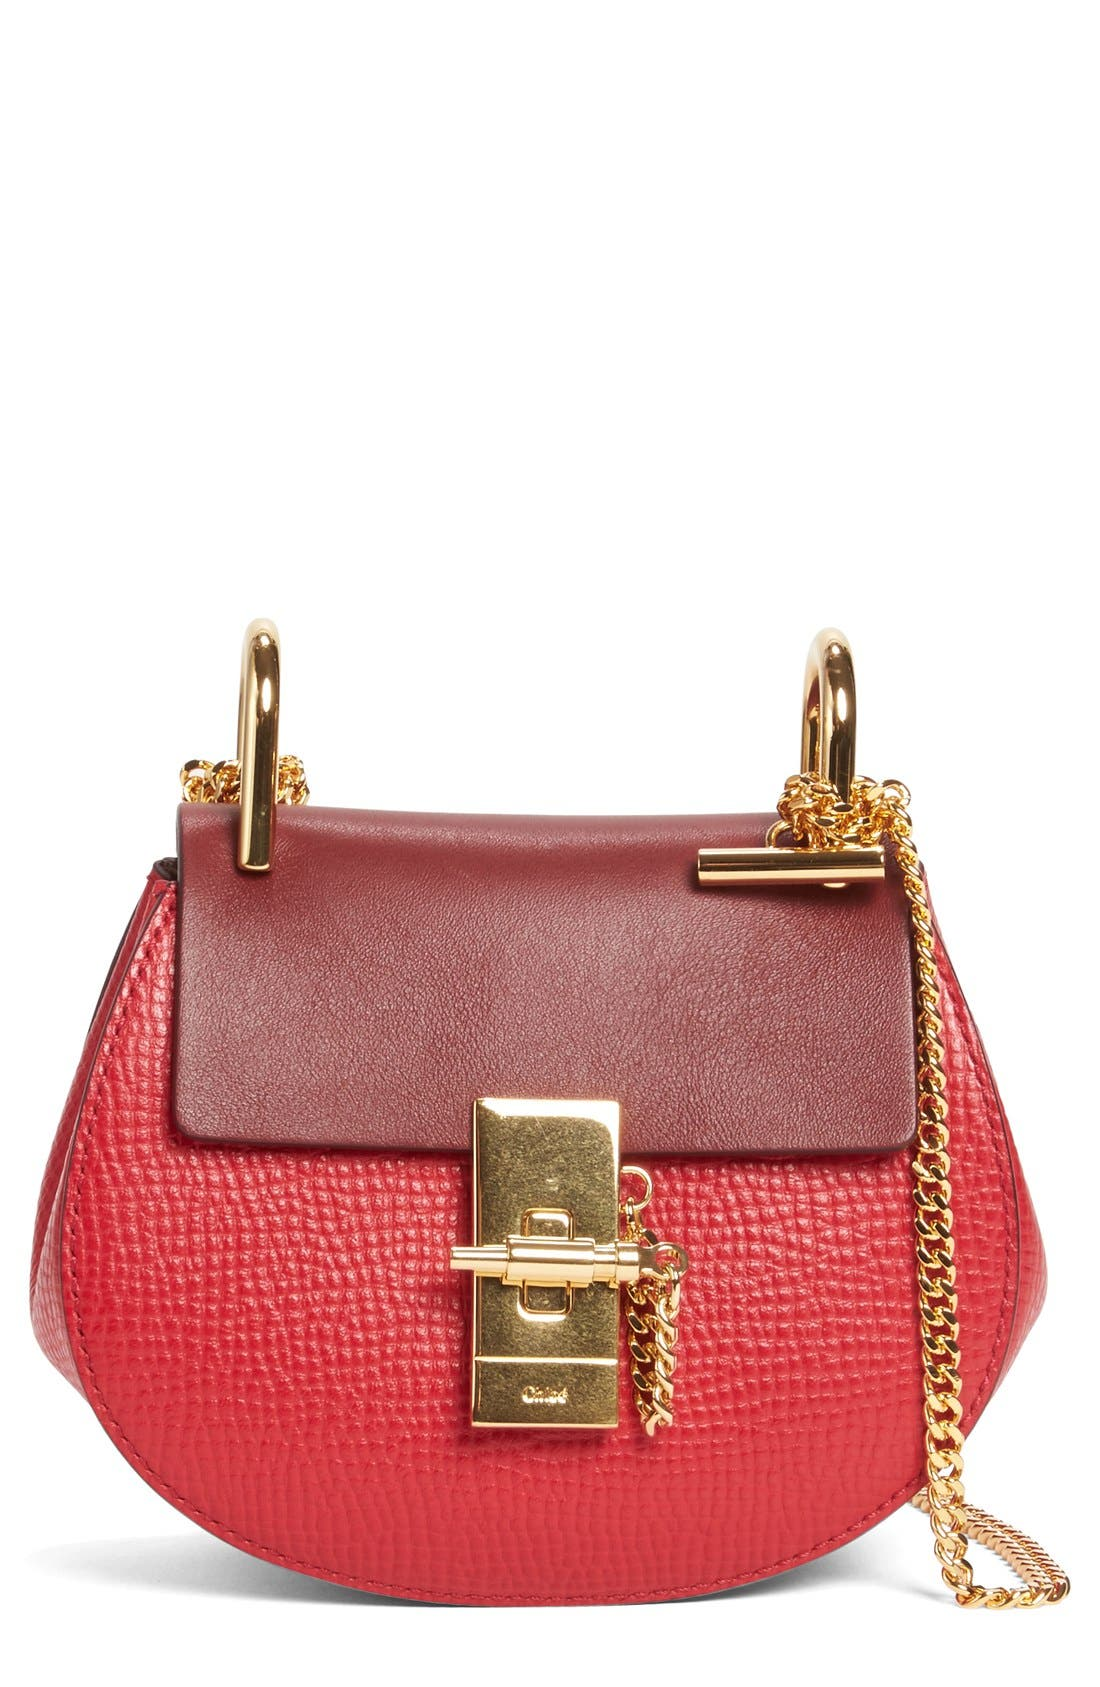 Alternate Image 1 Selected - Chloé Nano Drew Calfskin Shoulder Bag